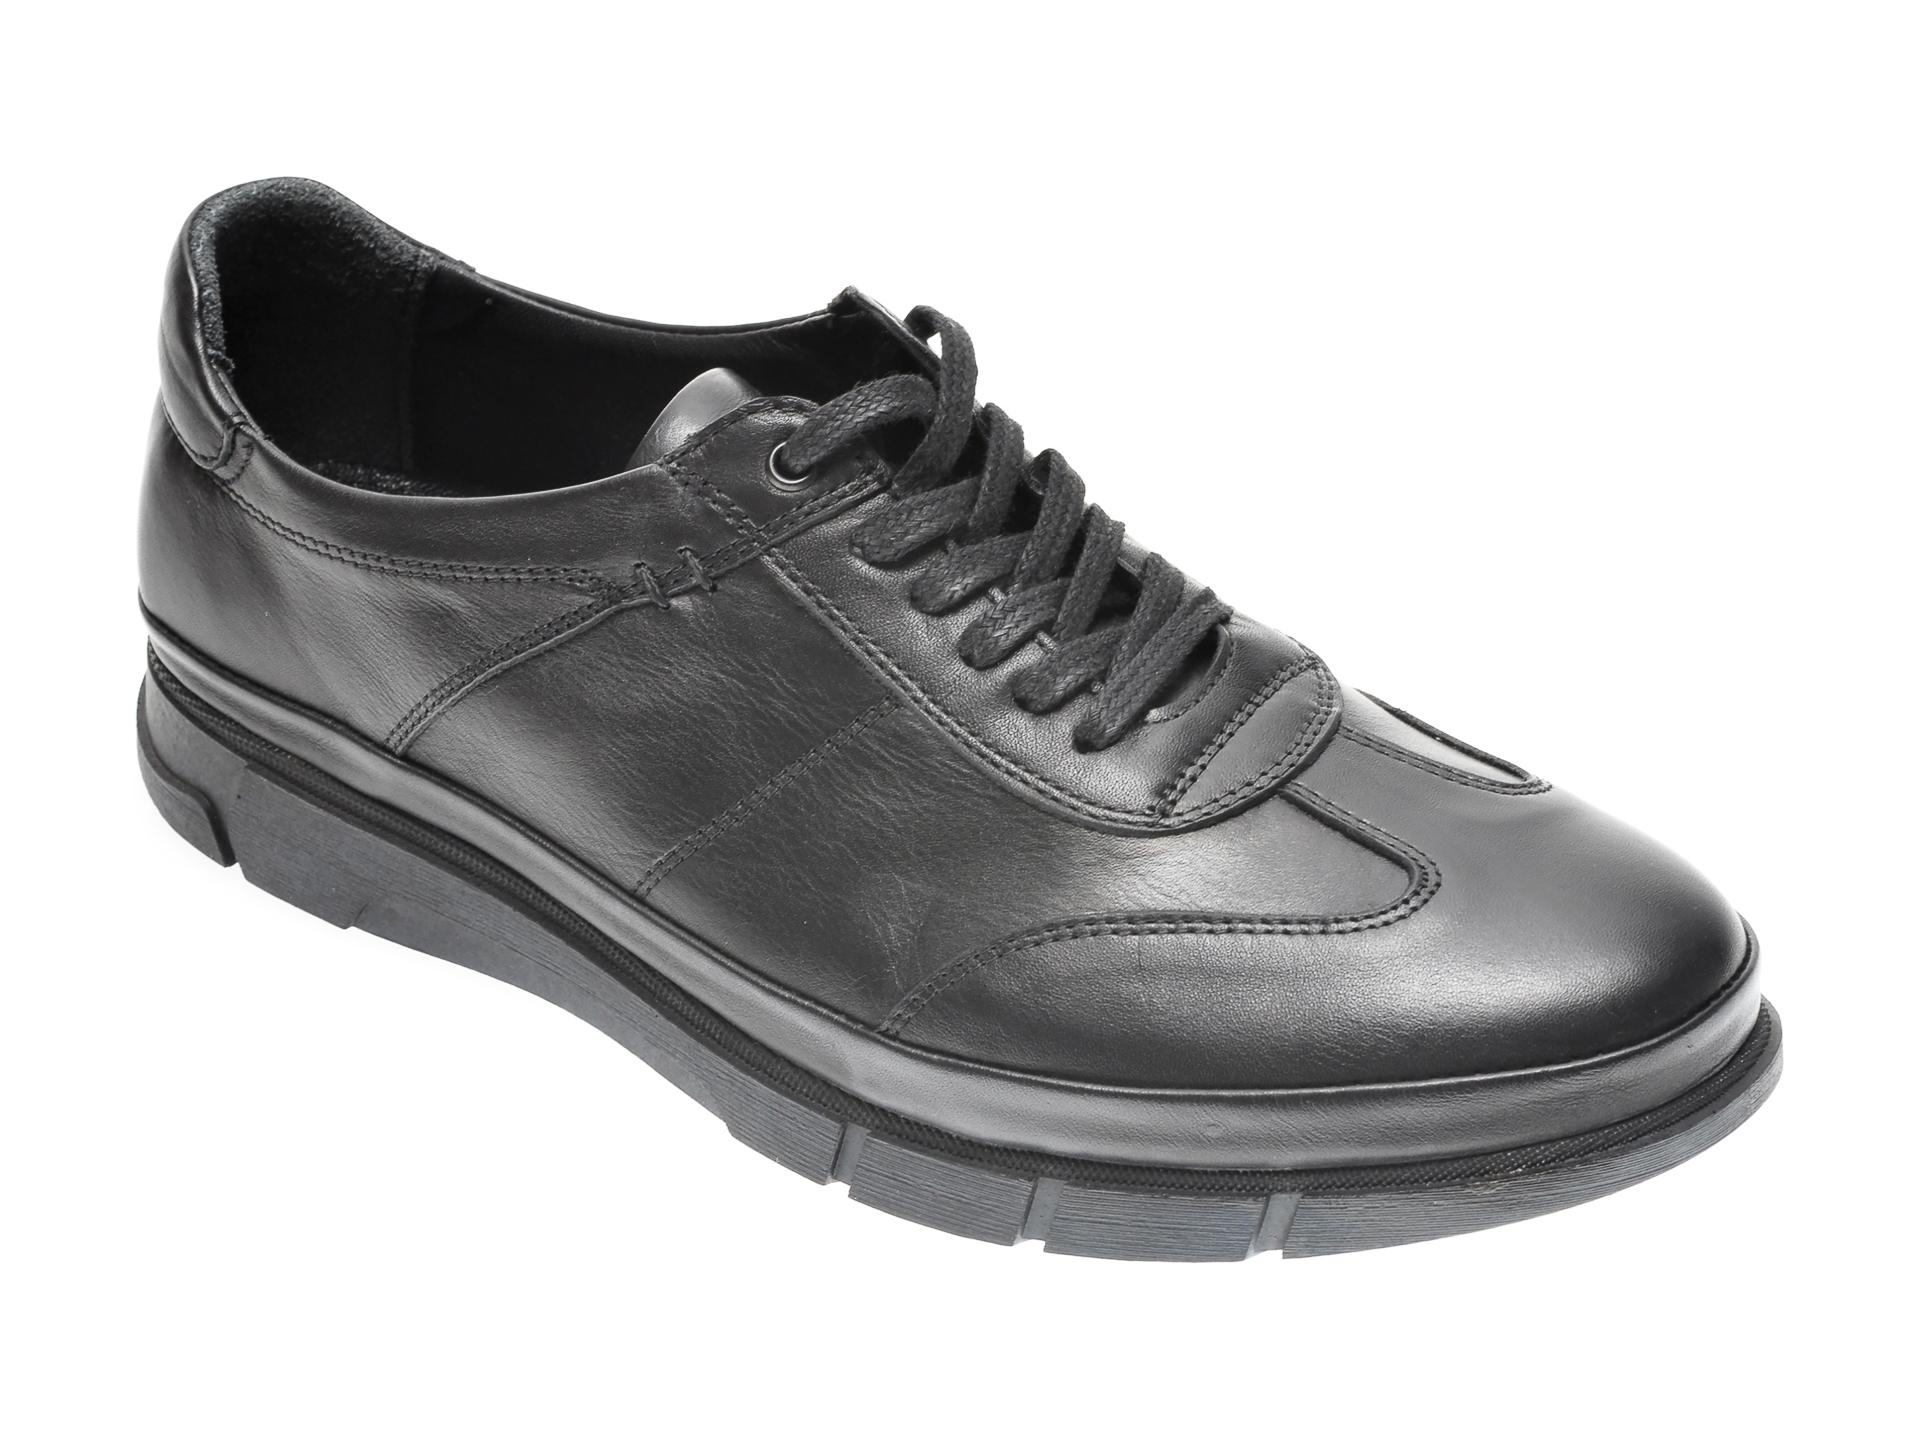 Pantofi OTTER negri, M5749, din piele naturala imagine